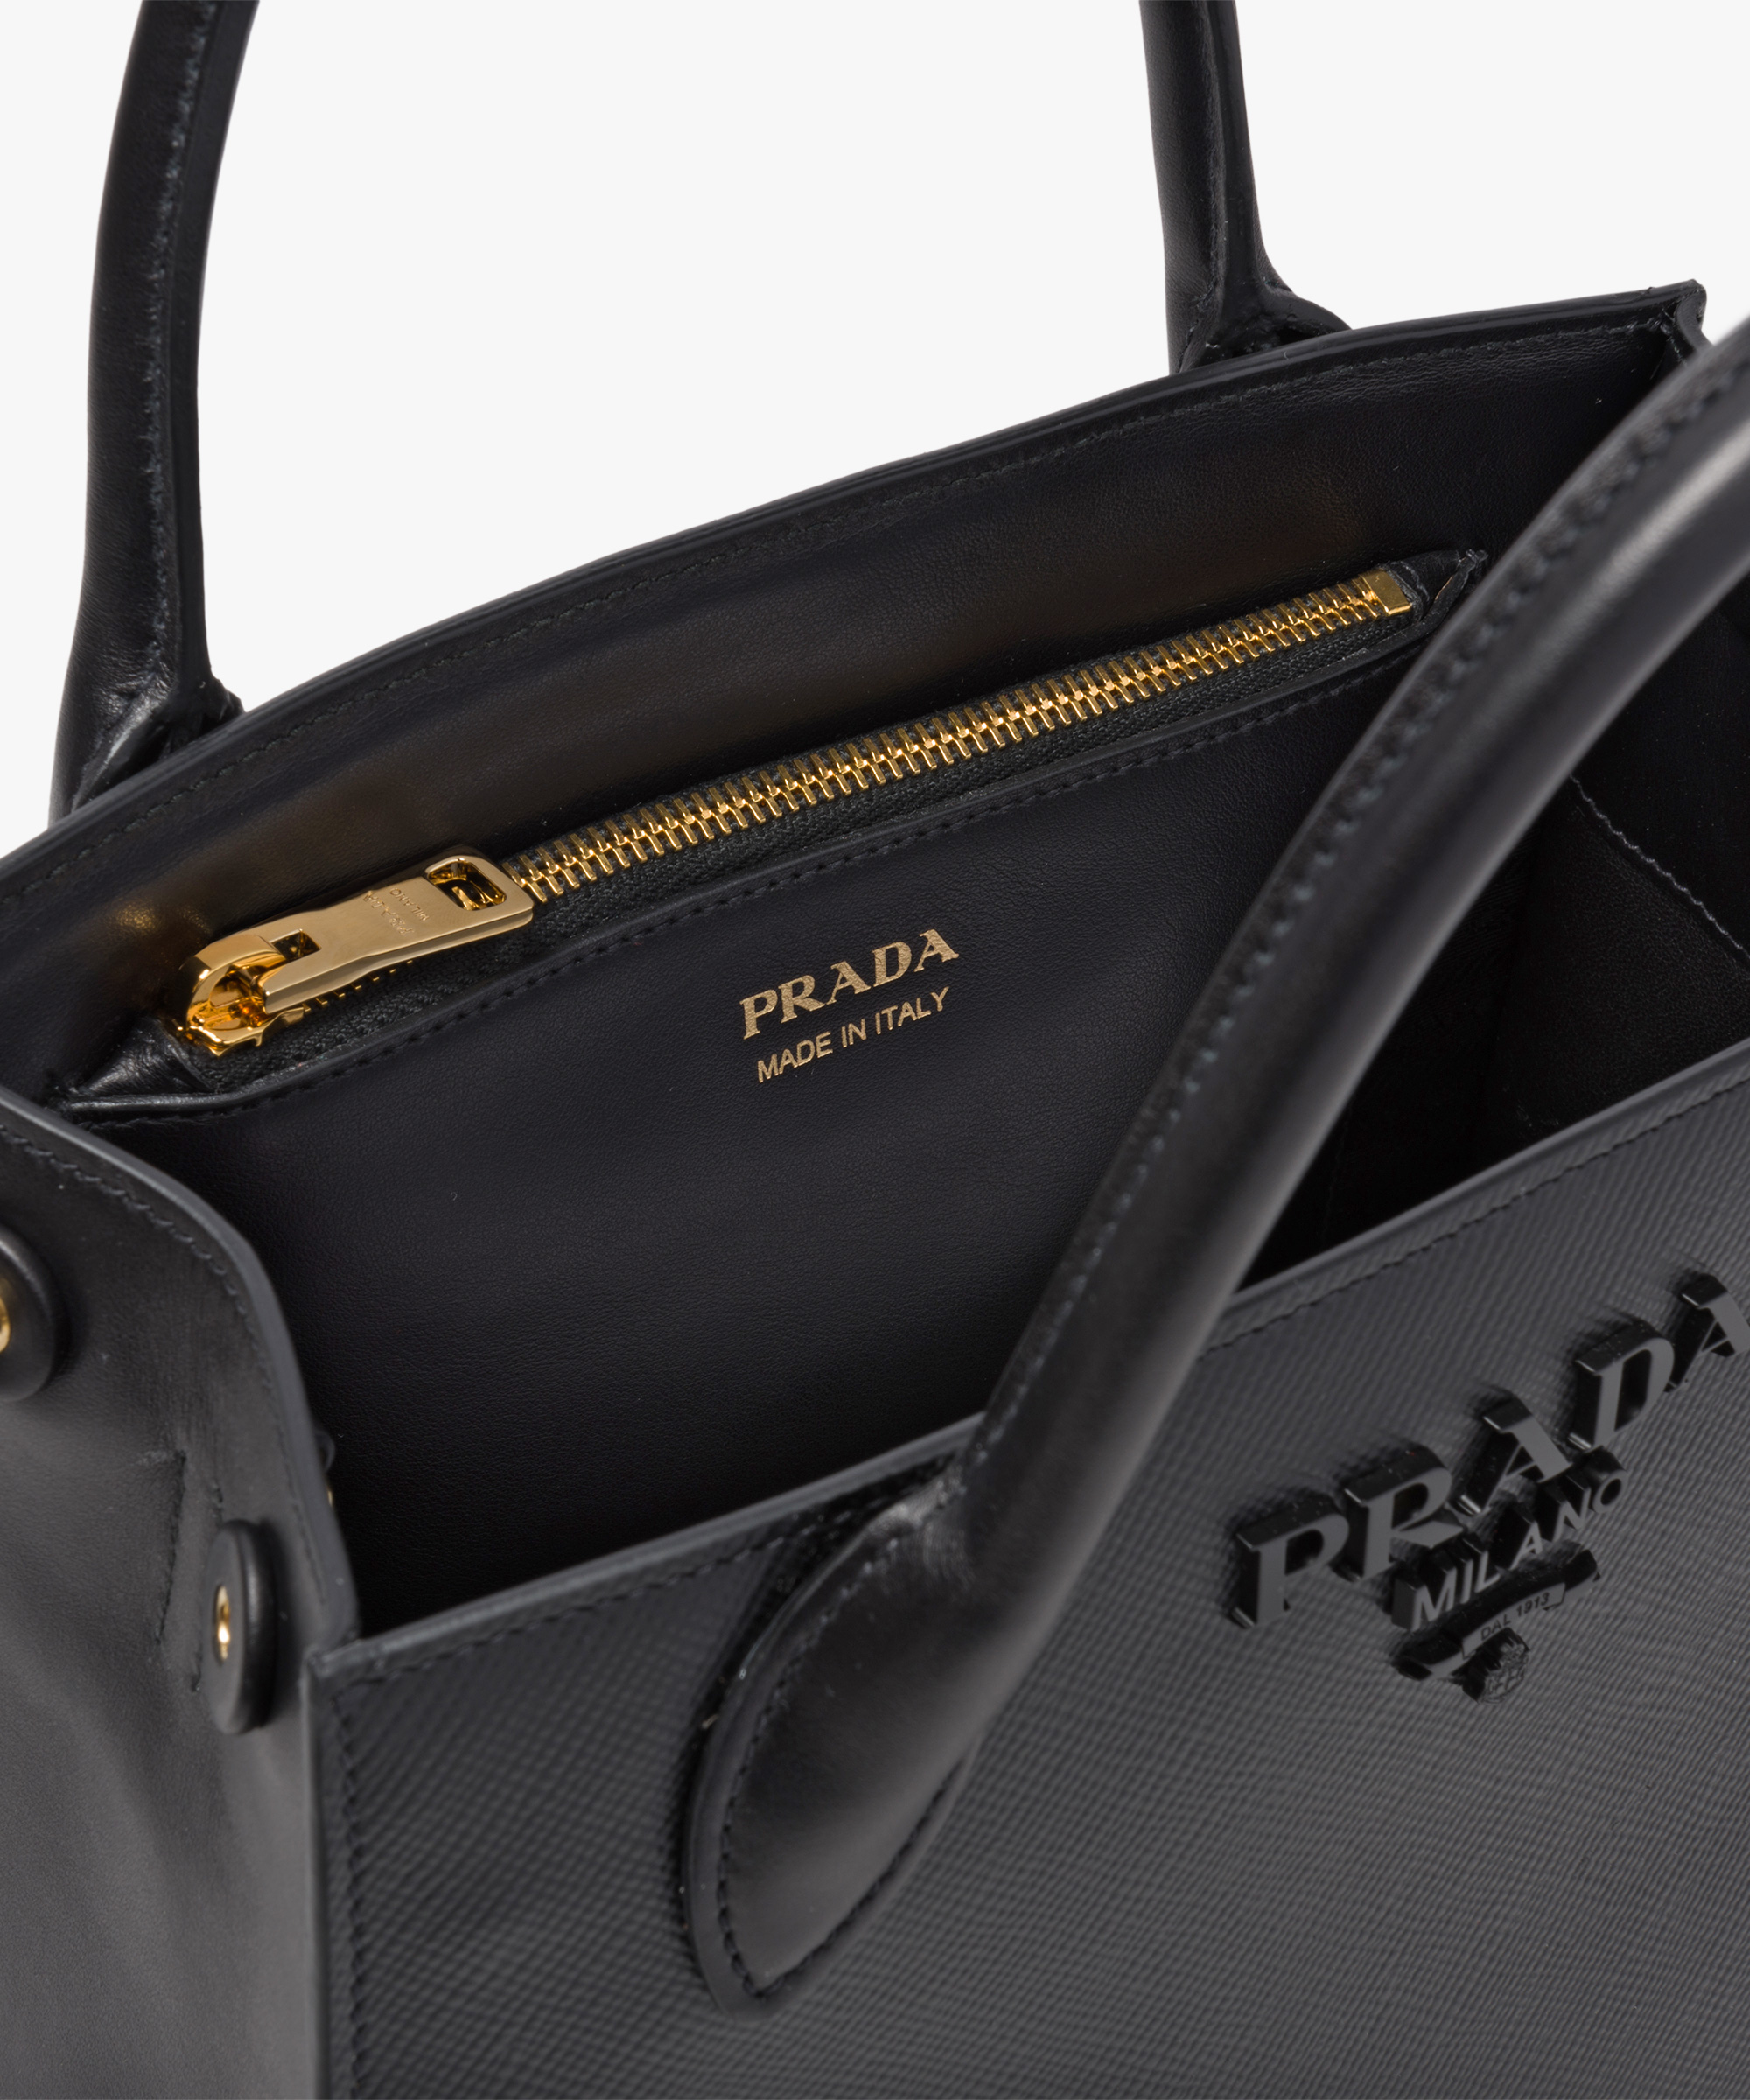 b271389126f3 Prada Monochrome Saffiano leather bag Prada BLACK ...